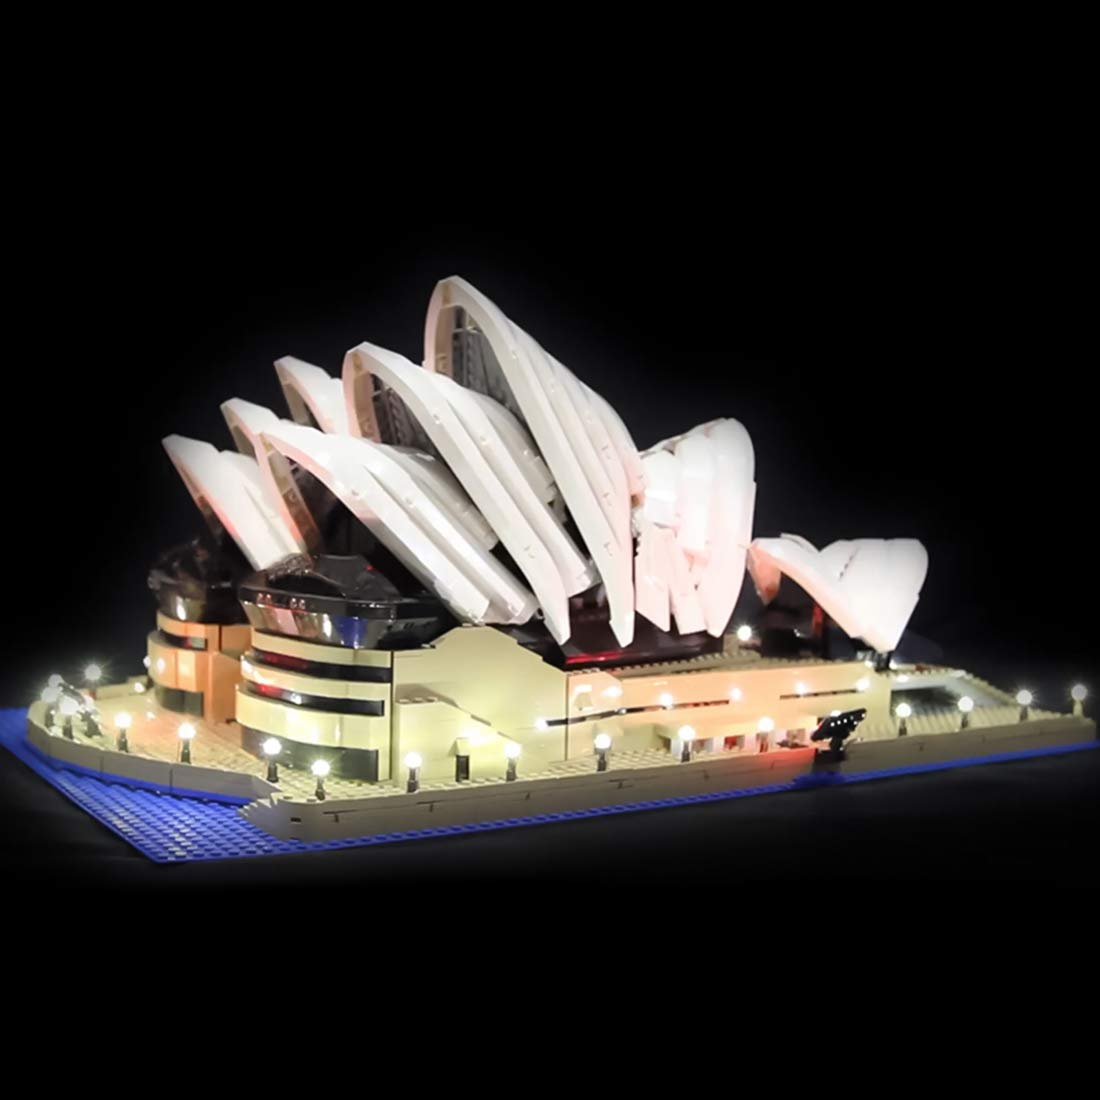 Poxl LED Beleuchtung Für Sydney Opera House LED Light LED Licht Kit Kompatibel Mit Lego10234 - Lego Modell Nicht Enthalten